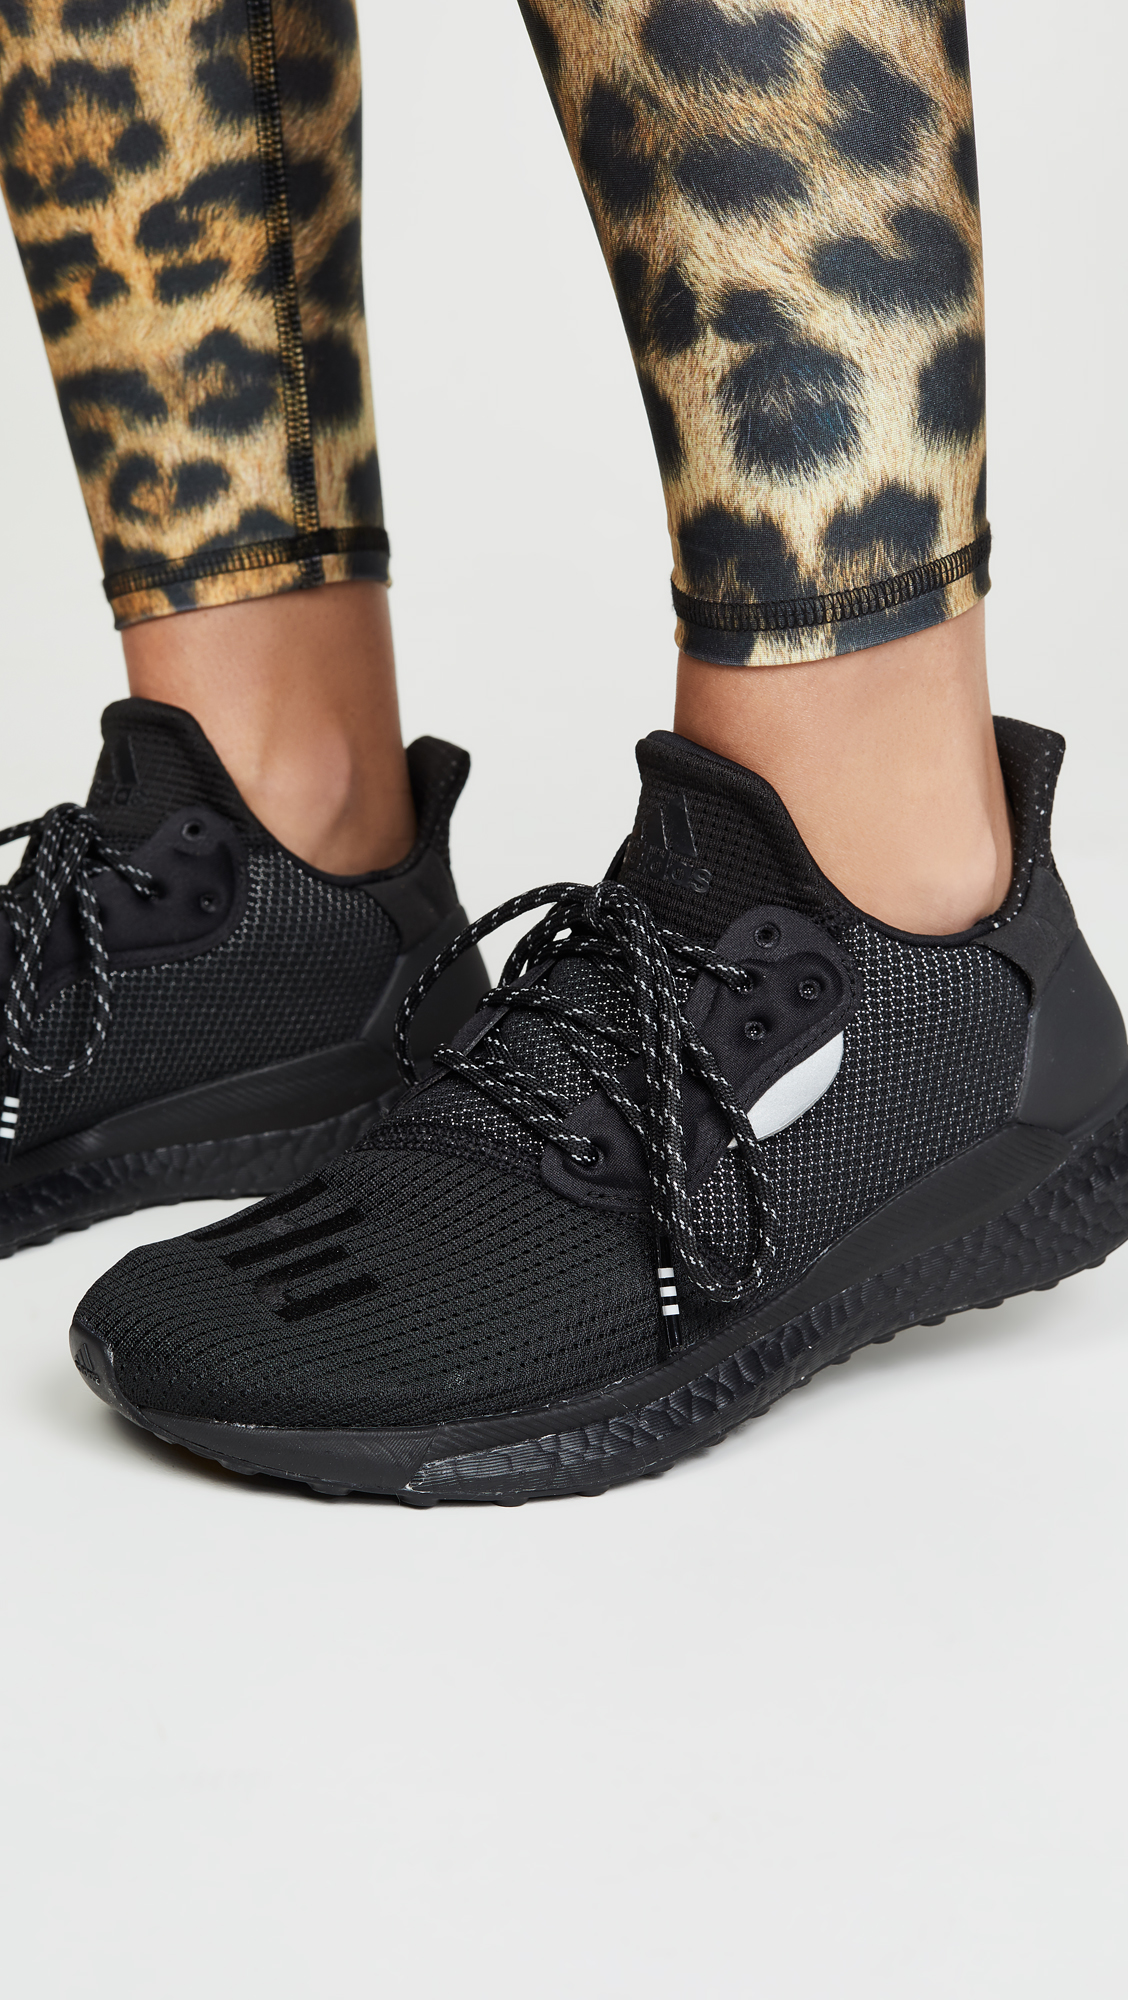 adidas x Pharrell Solar Hu Prd Sneakers | SHOPBOP